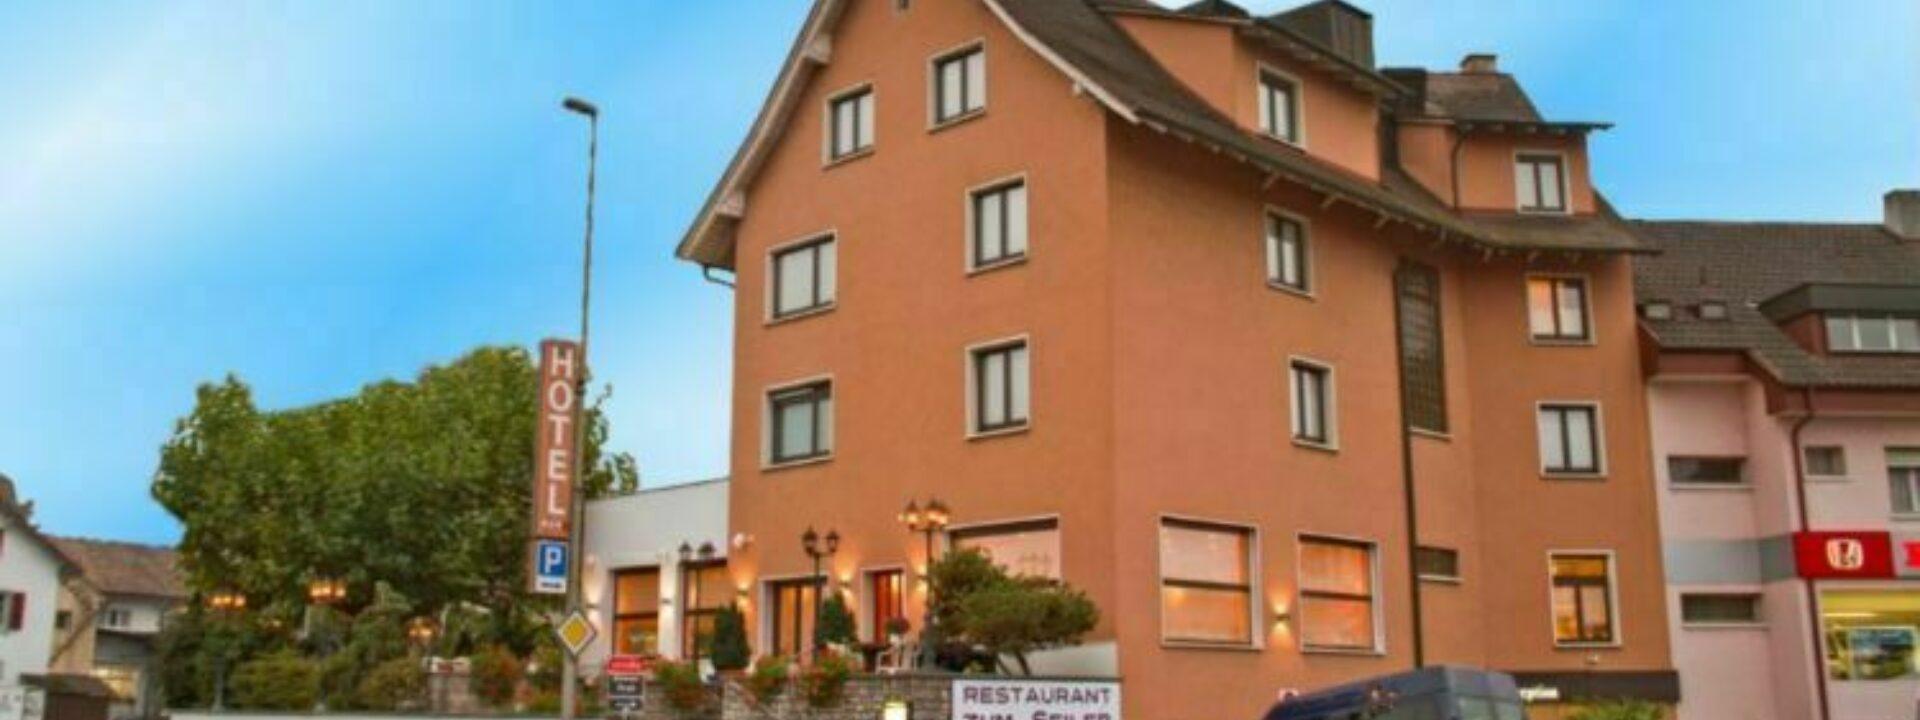 Seiler's Hotel Radackerhof